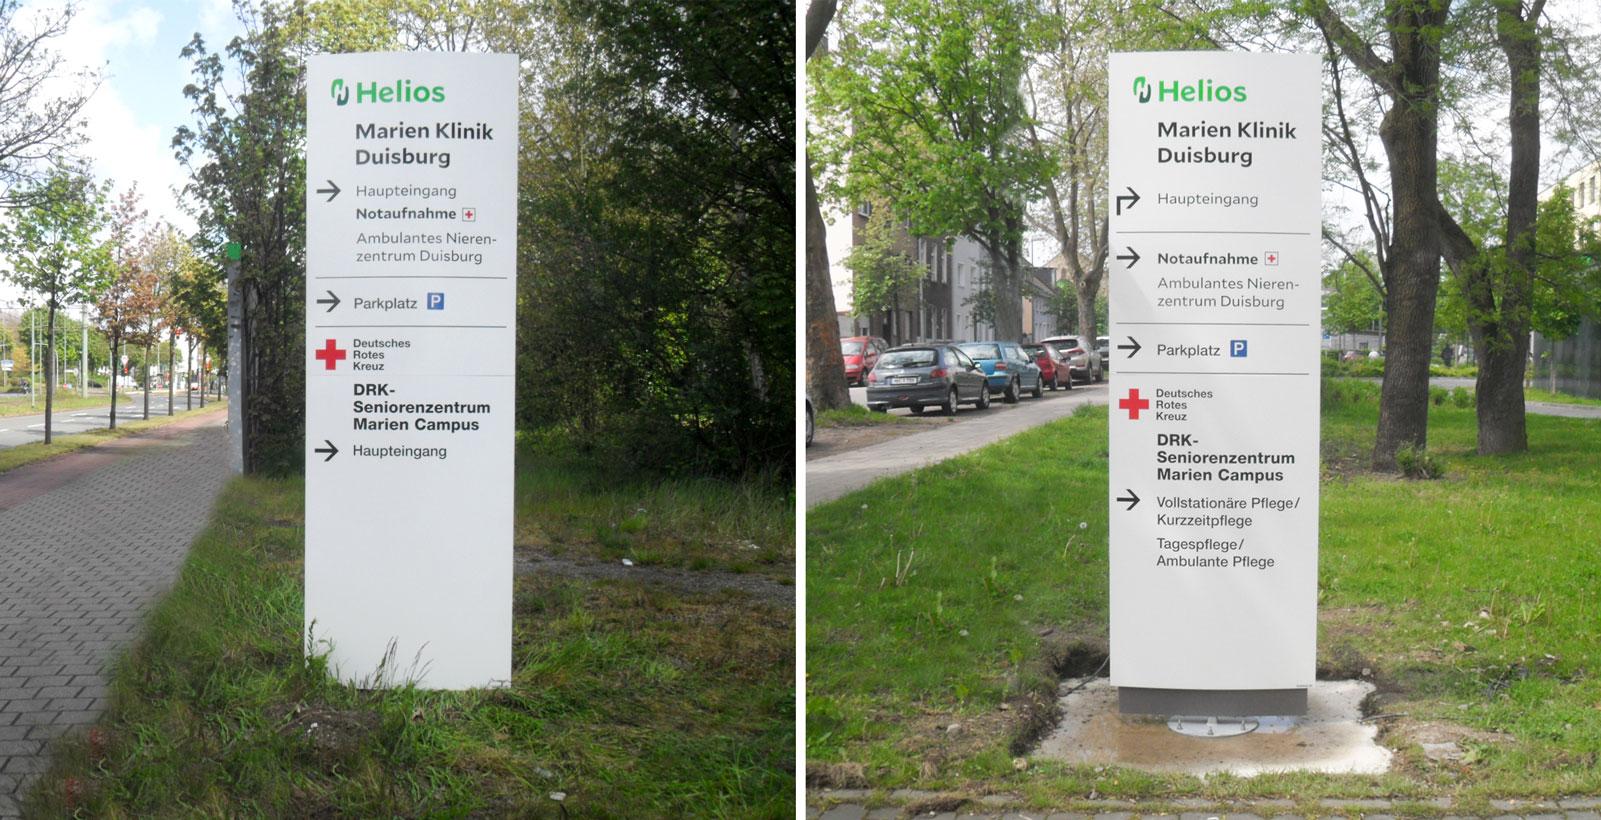 Marienkrankenhaus Monolith Leitsystem Exterior Kliniken